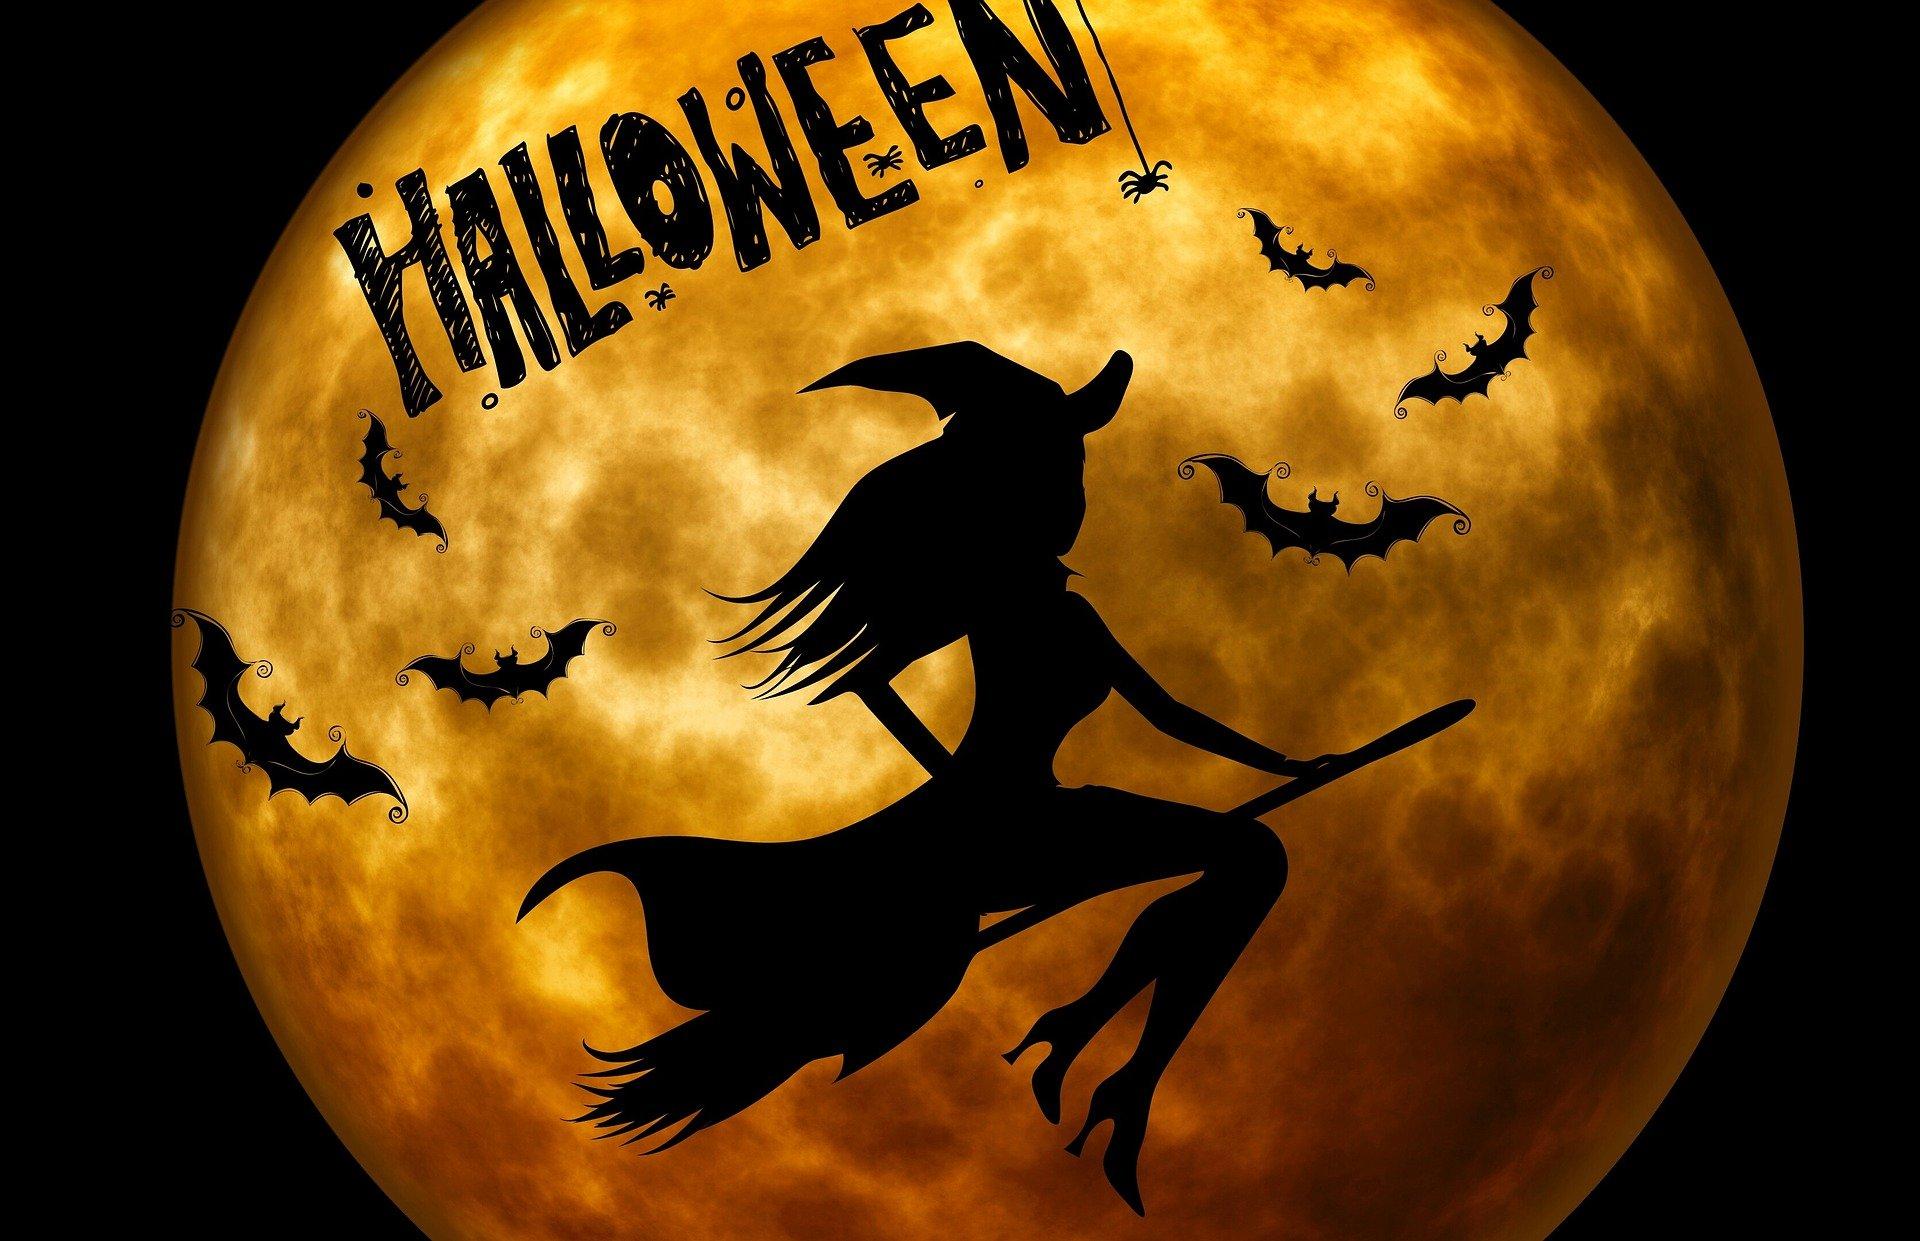 5 manualidades para hacer en Halloween